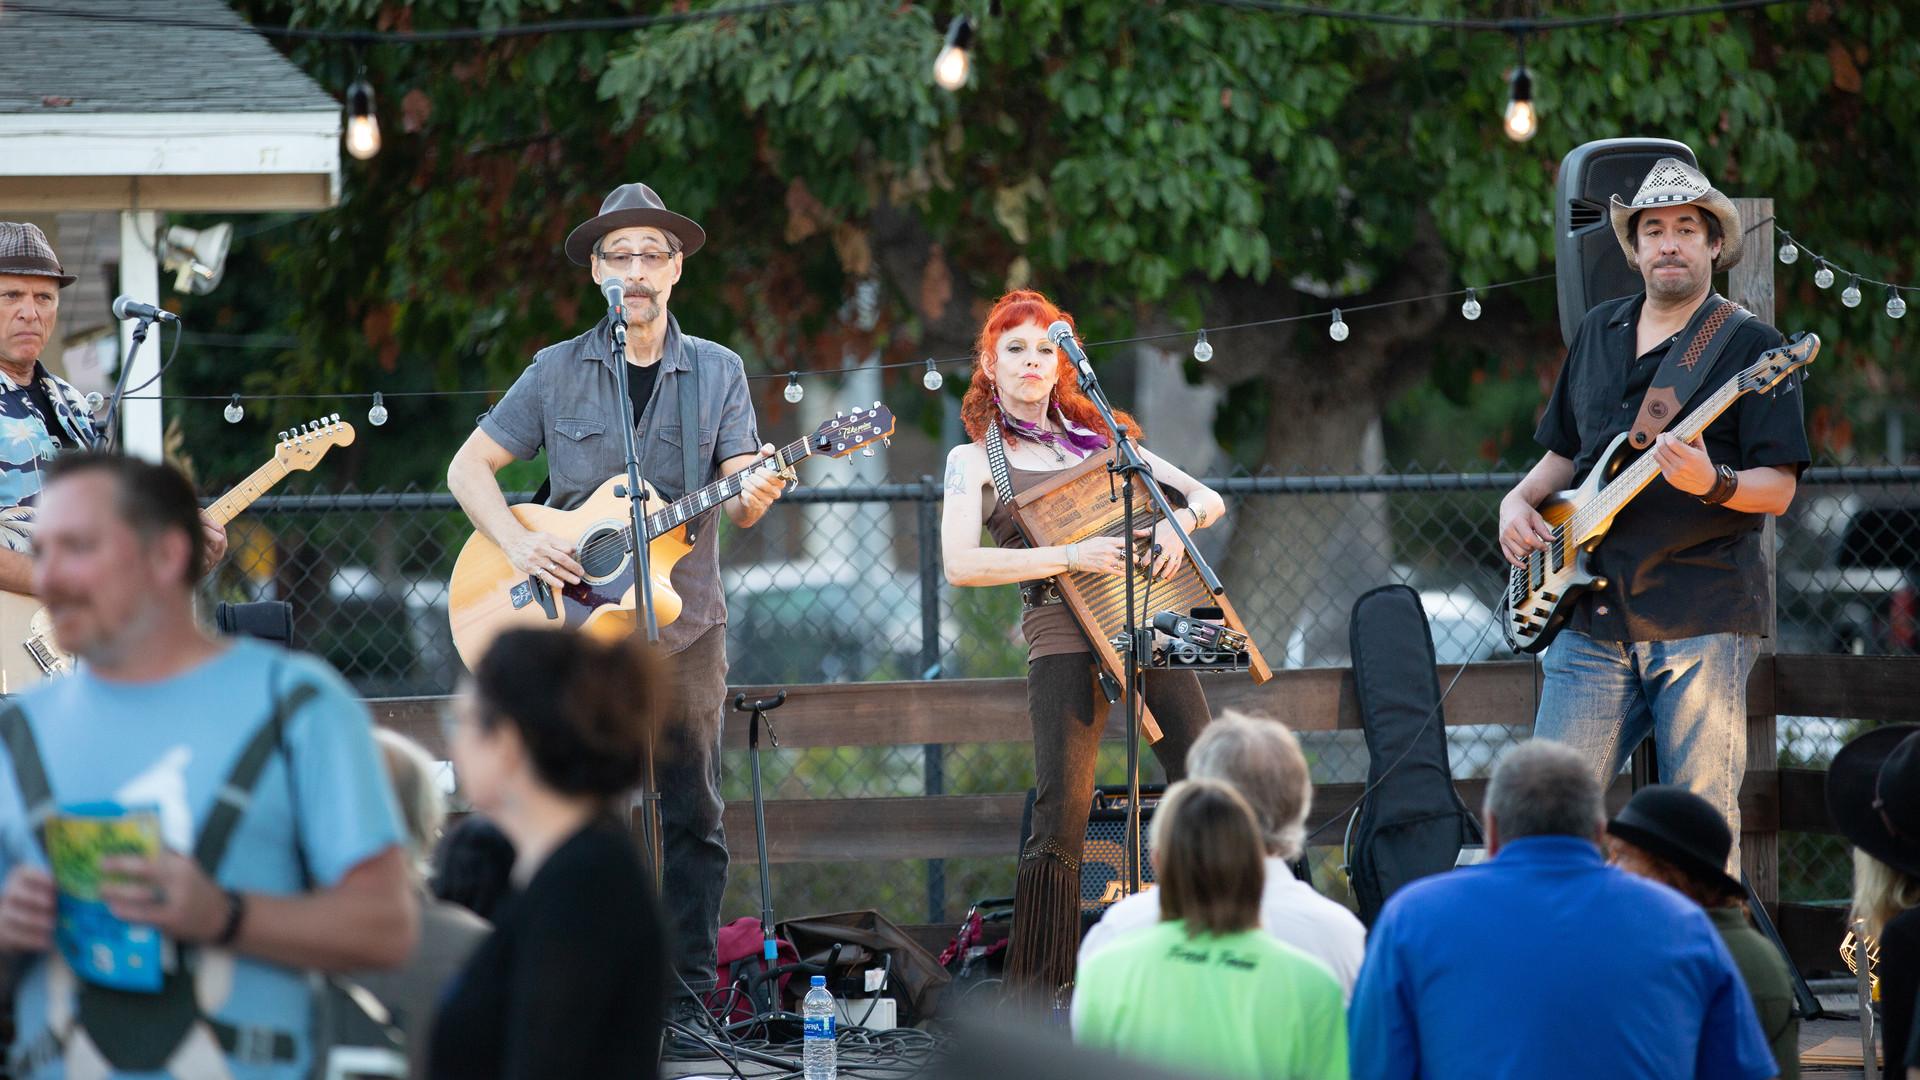 Band at Community Garden.jpg